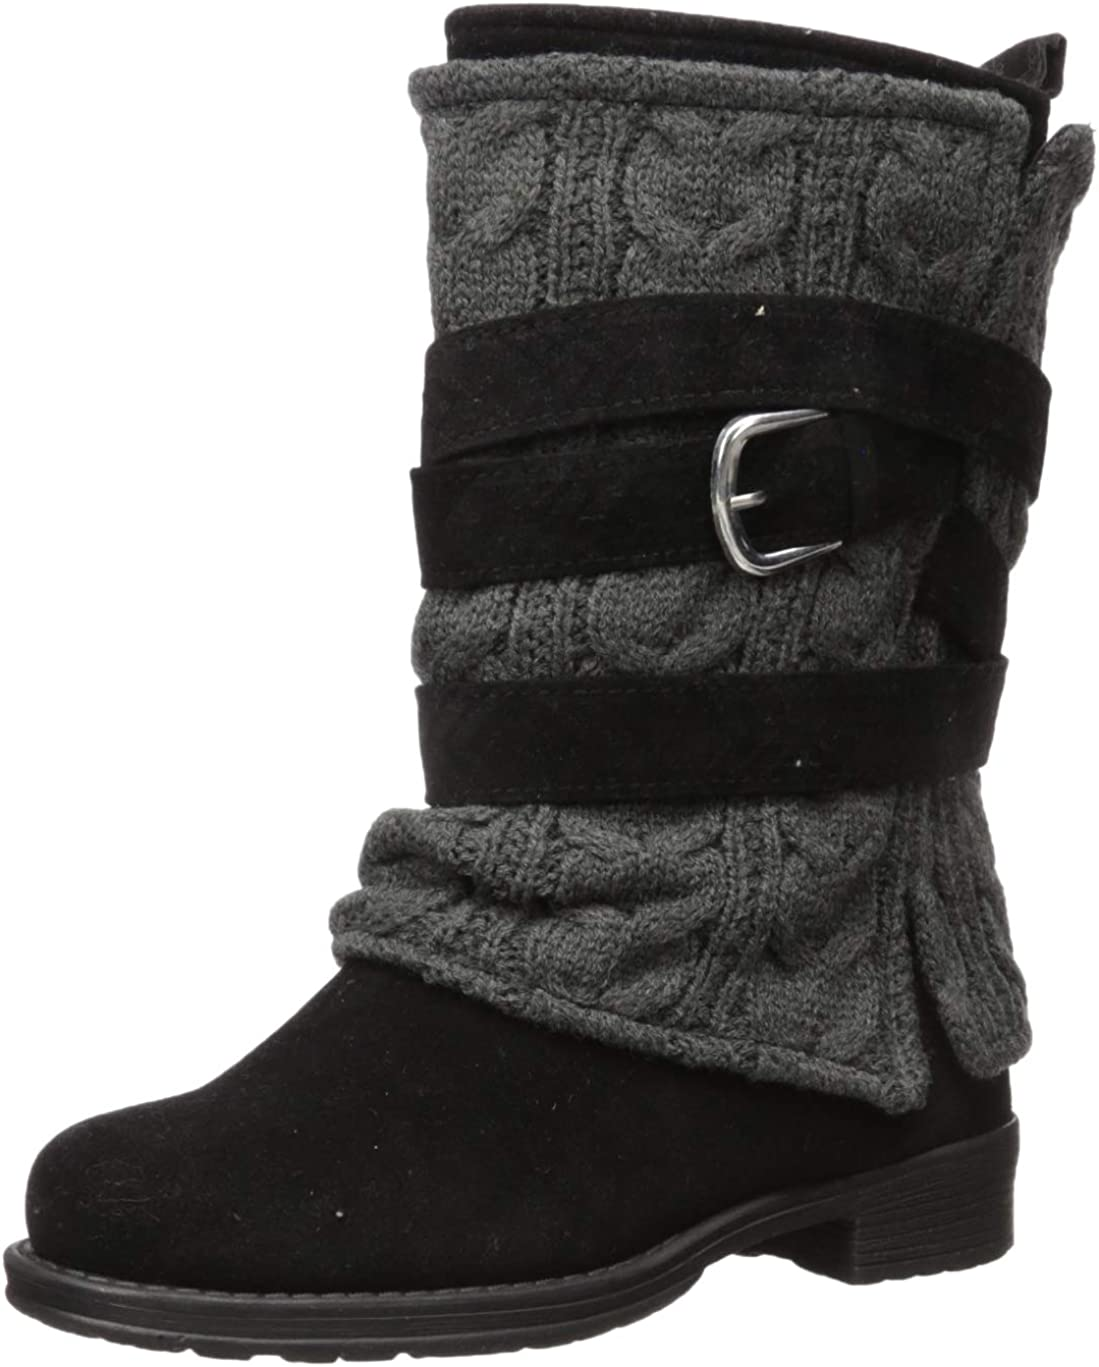 MUK LUKS Women's Nikita Boots Mid Calf